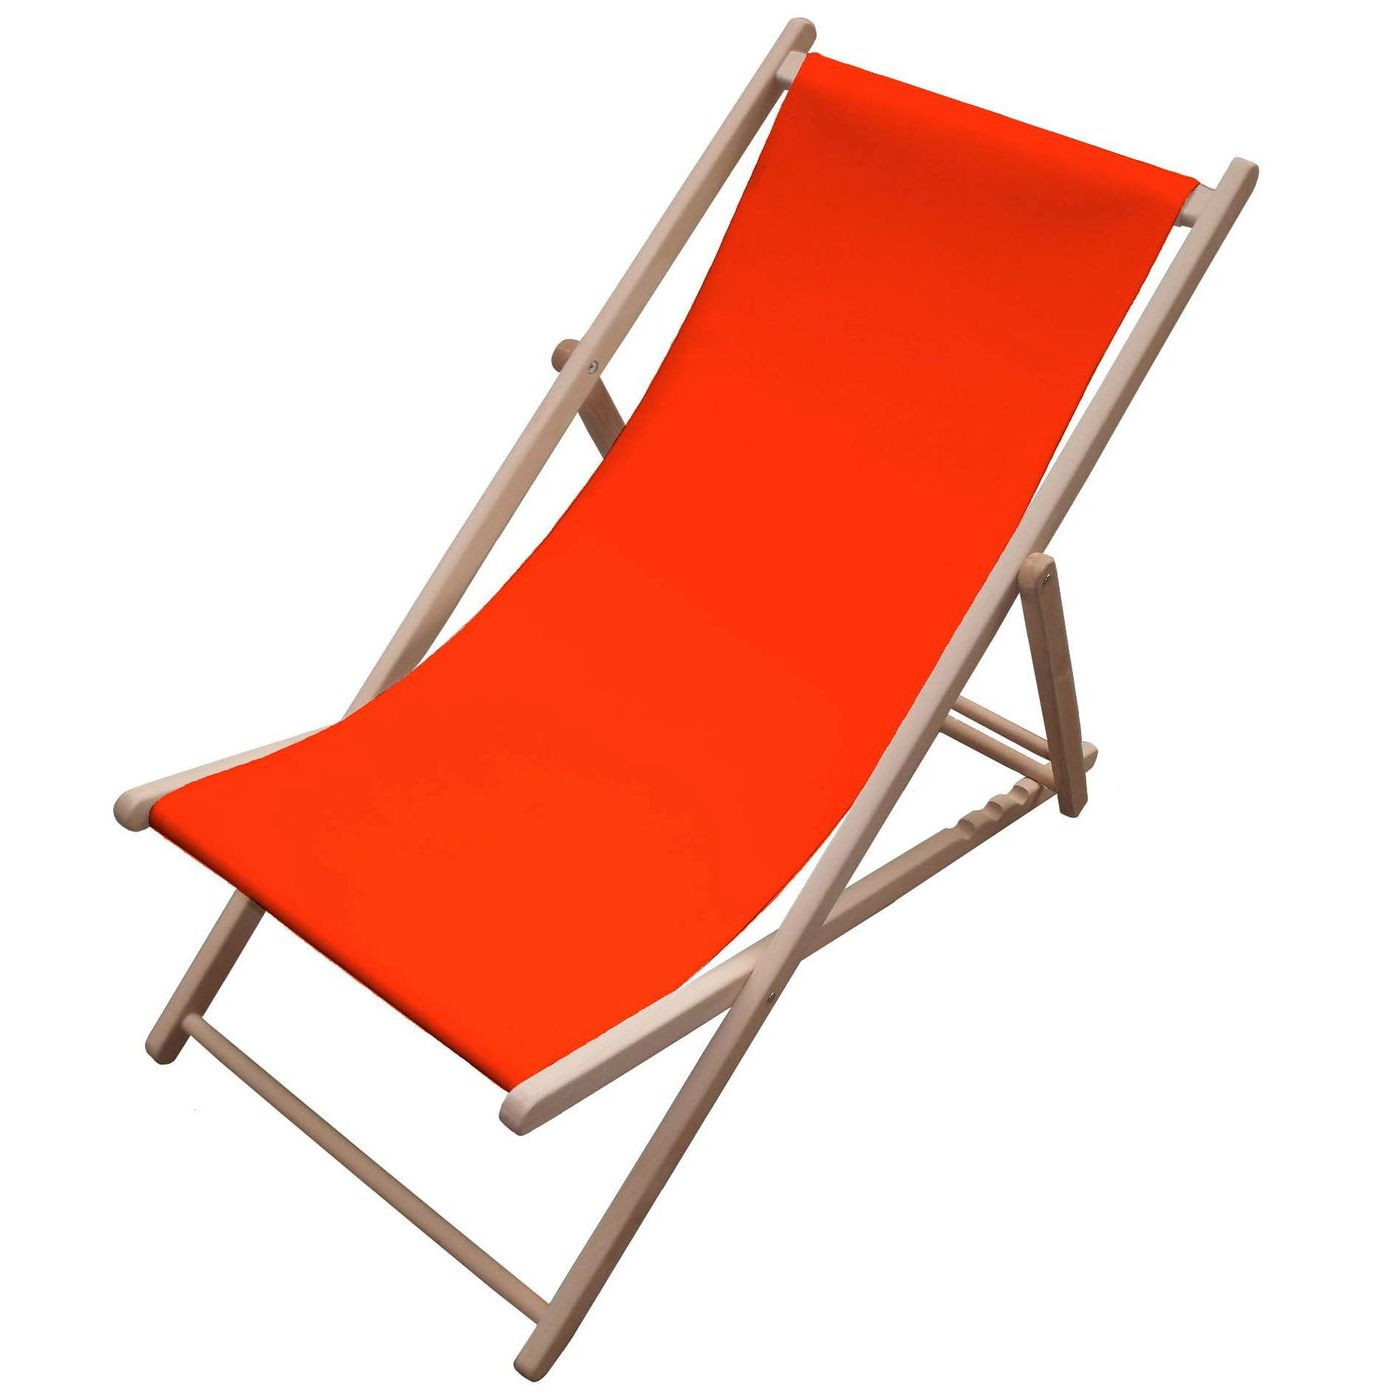 kare garten gartenm bel online kaufen mutoni m bel. Black Bedroom Furniture Sets. Home Design Ideas